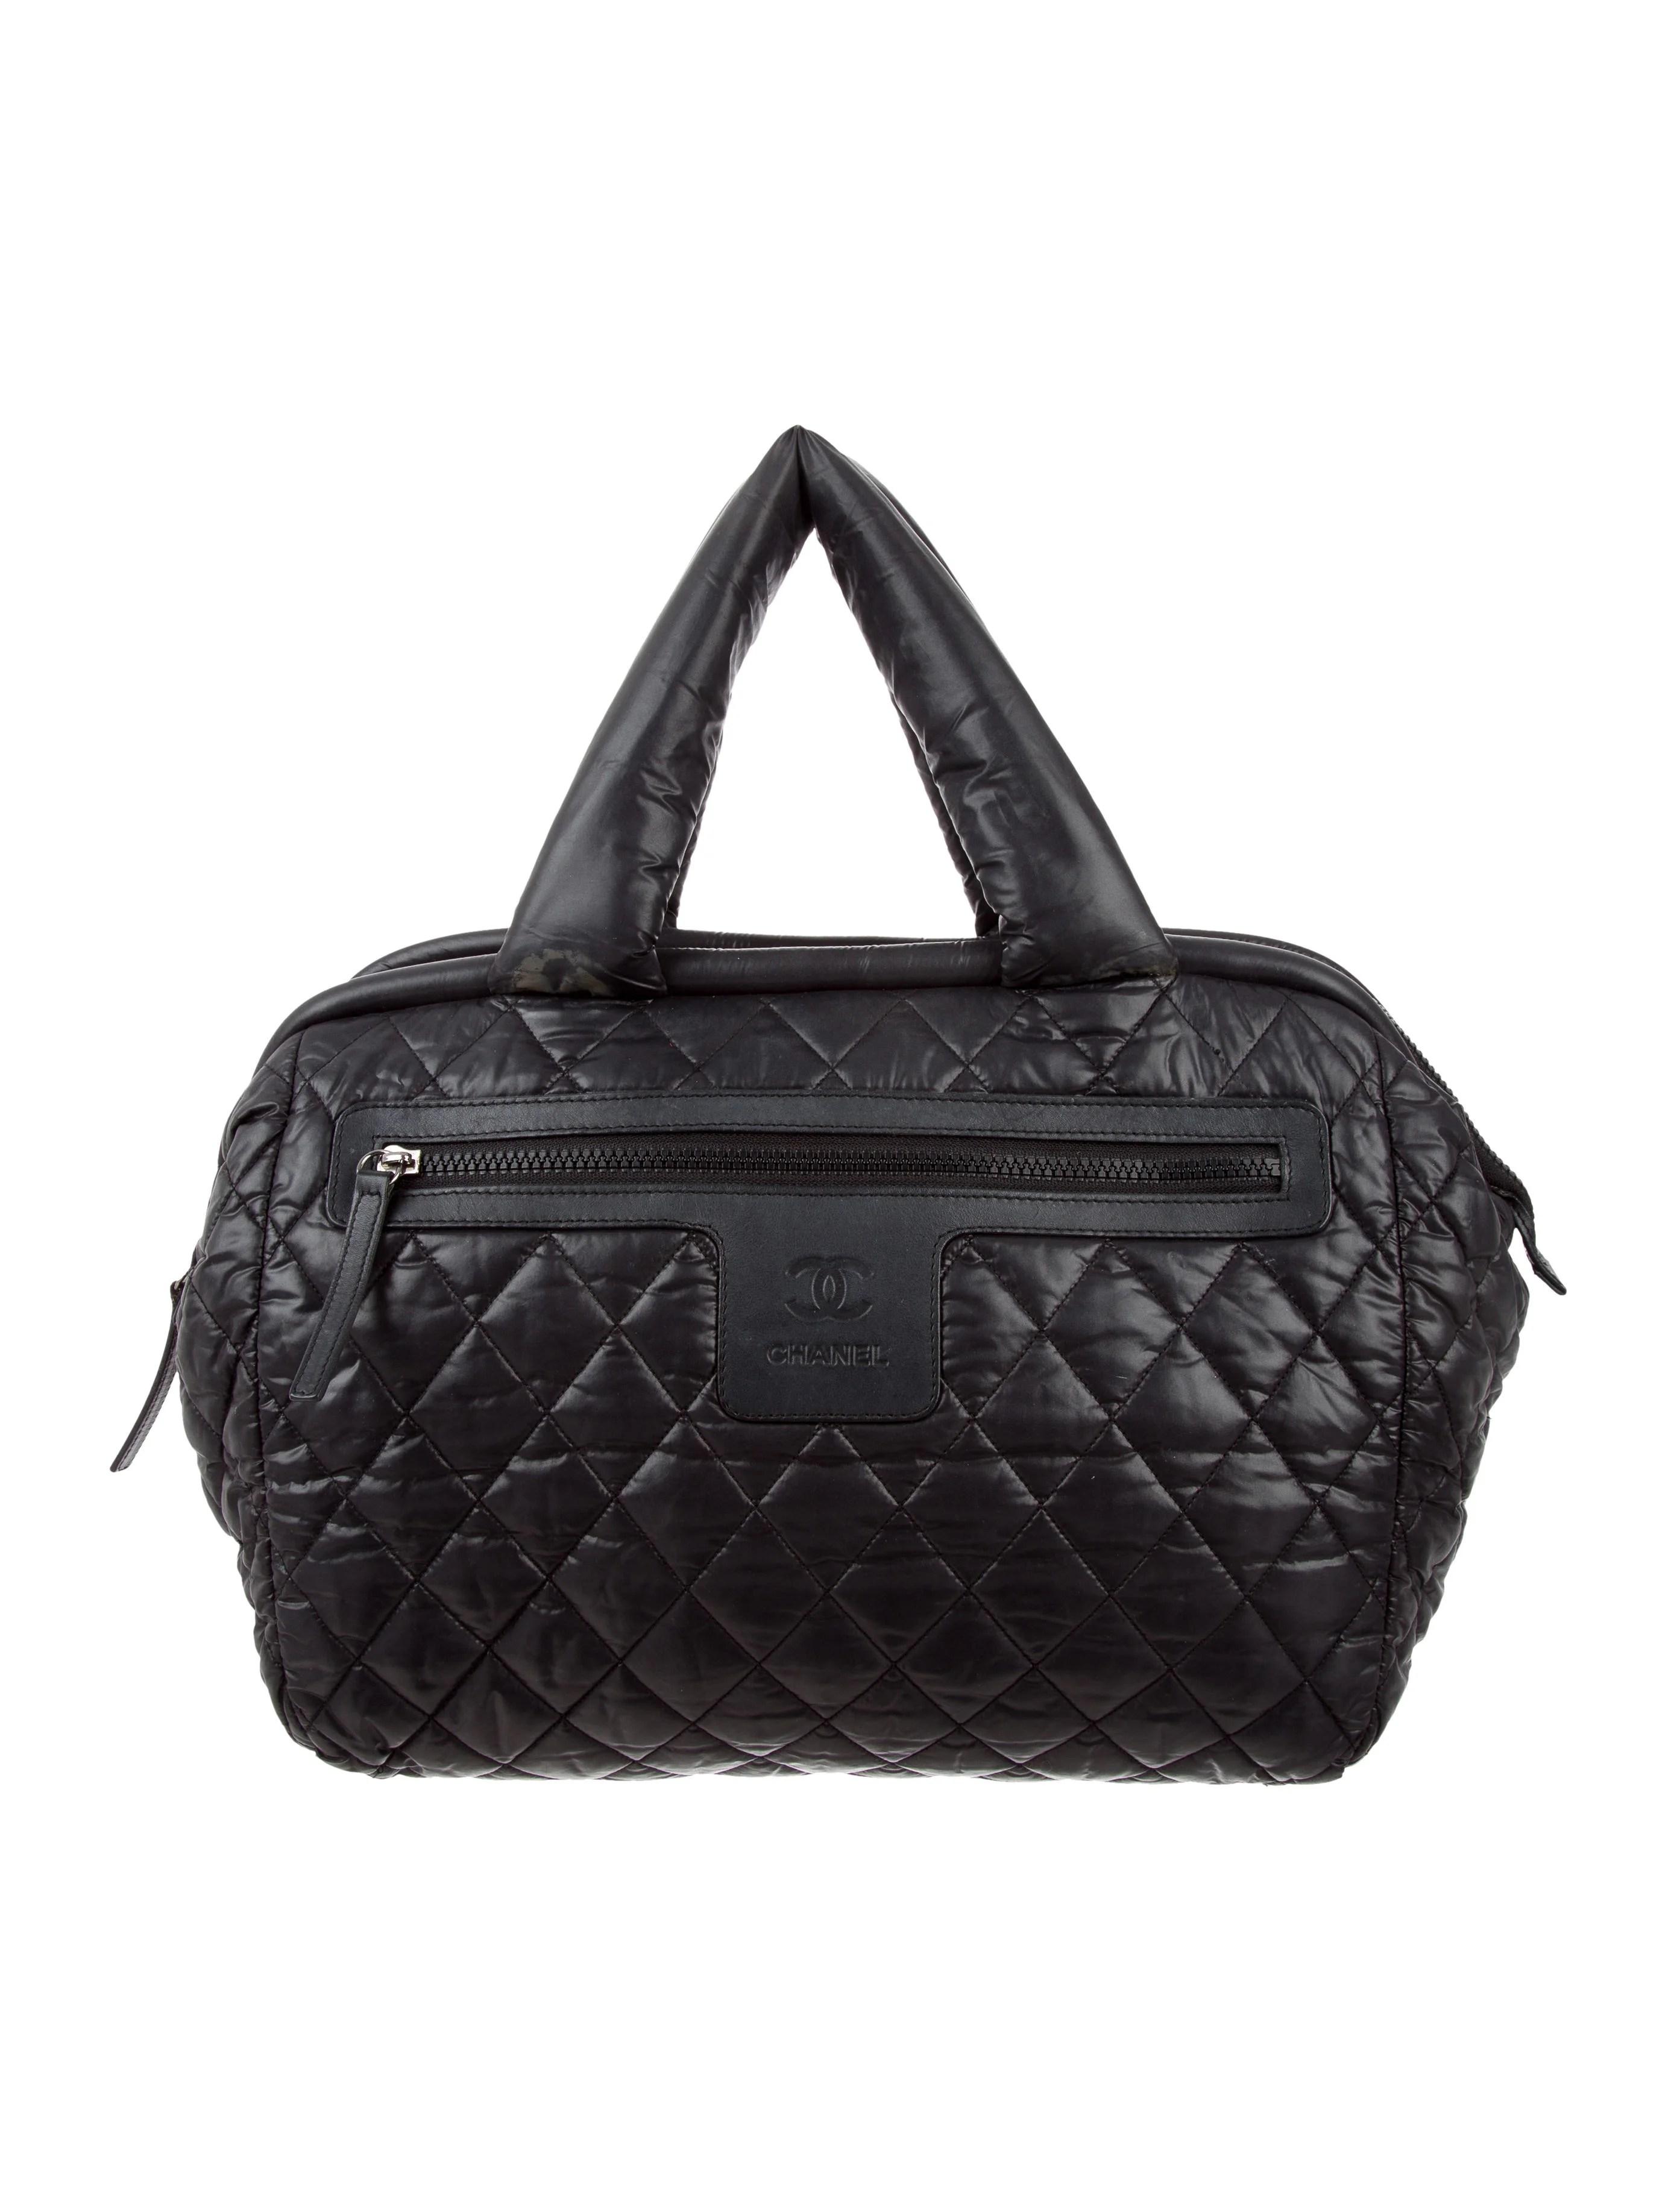 Chanel Coco Cocoon Bowler Bag - Handbags - CHA196779   The ...